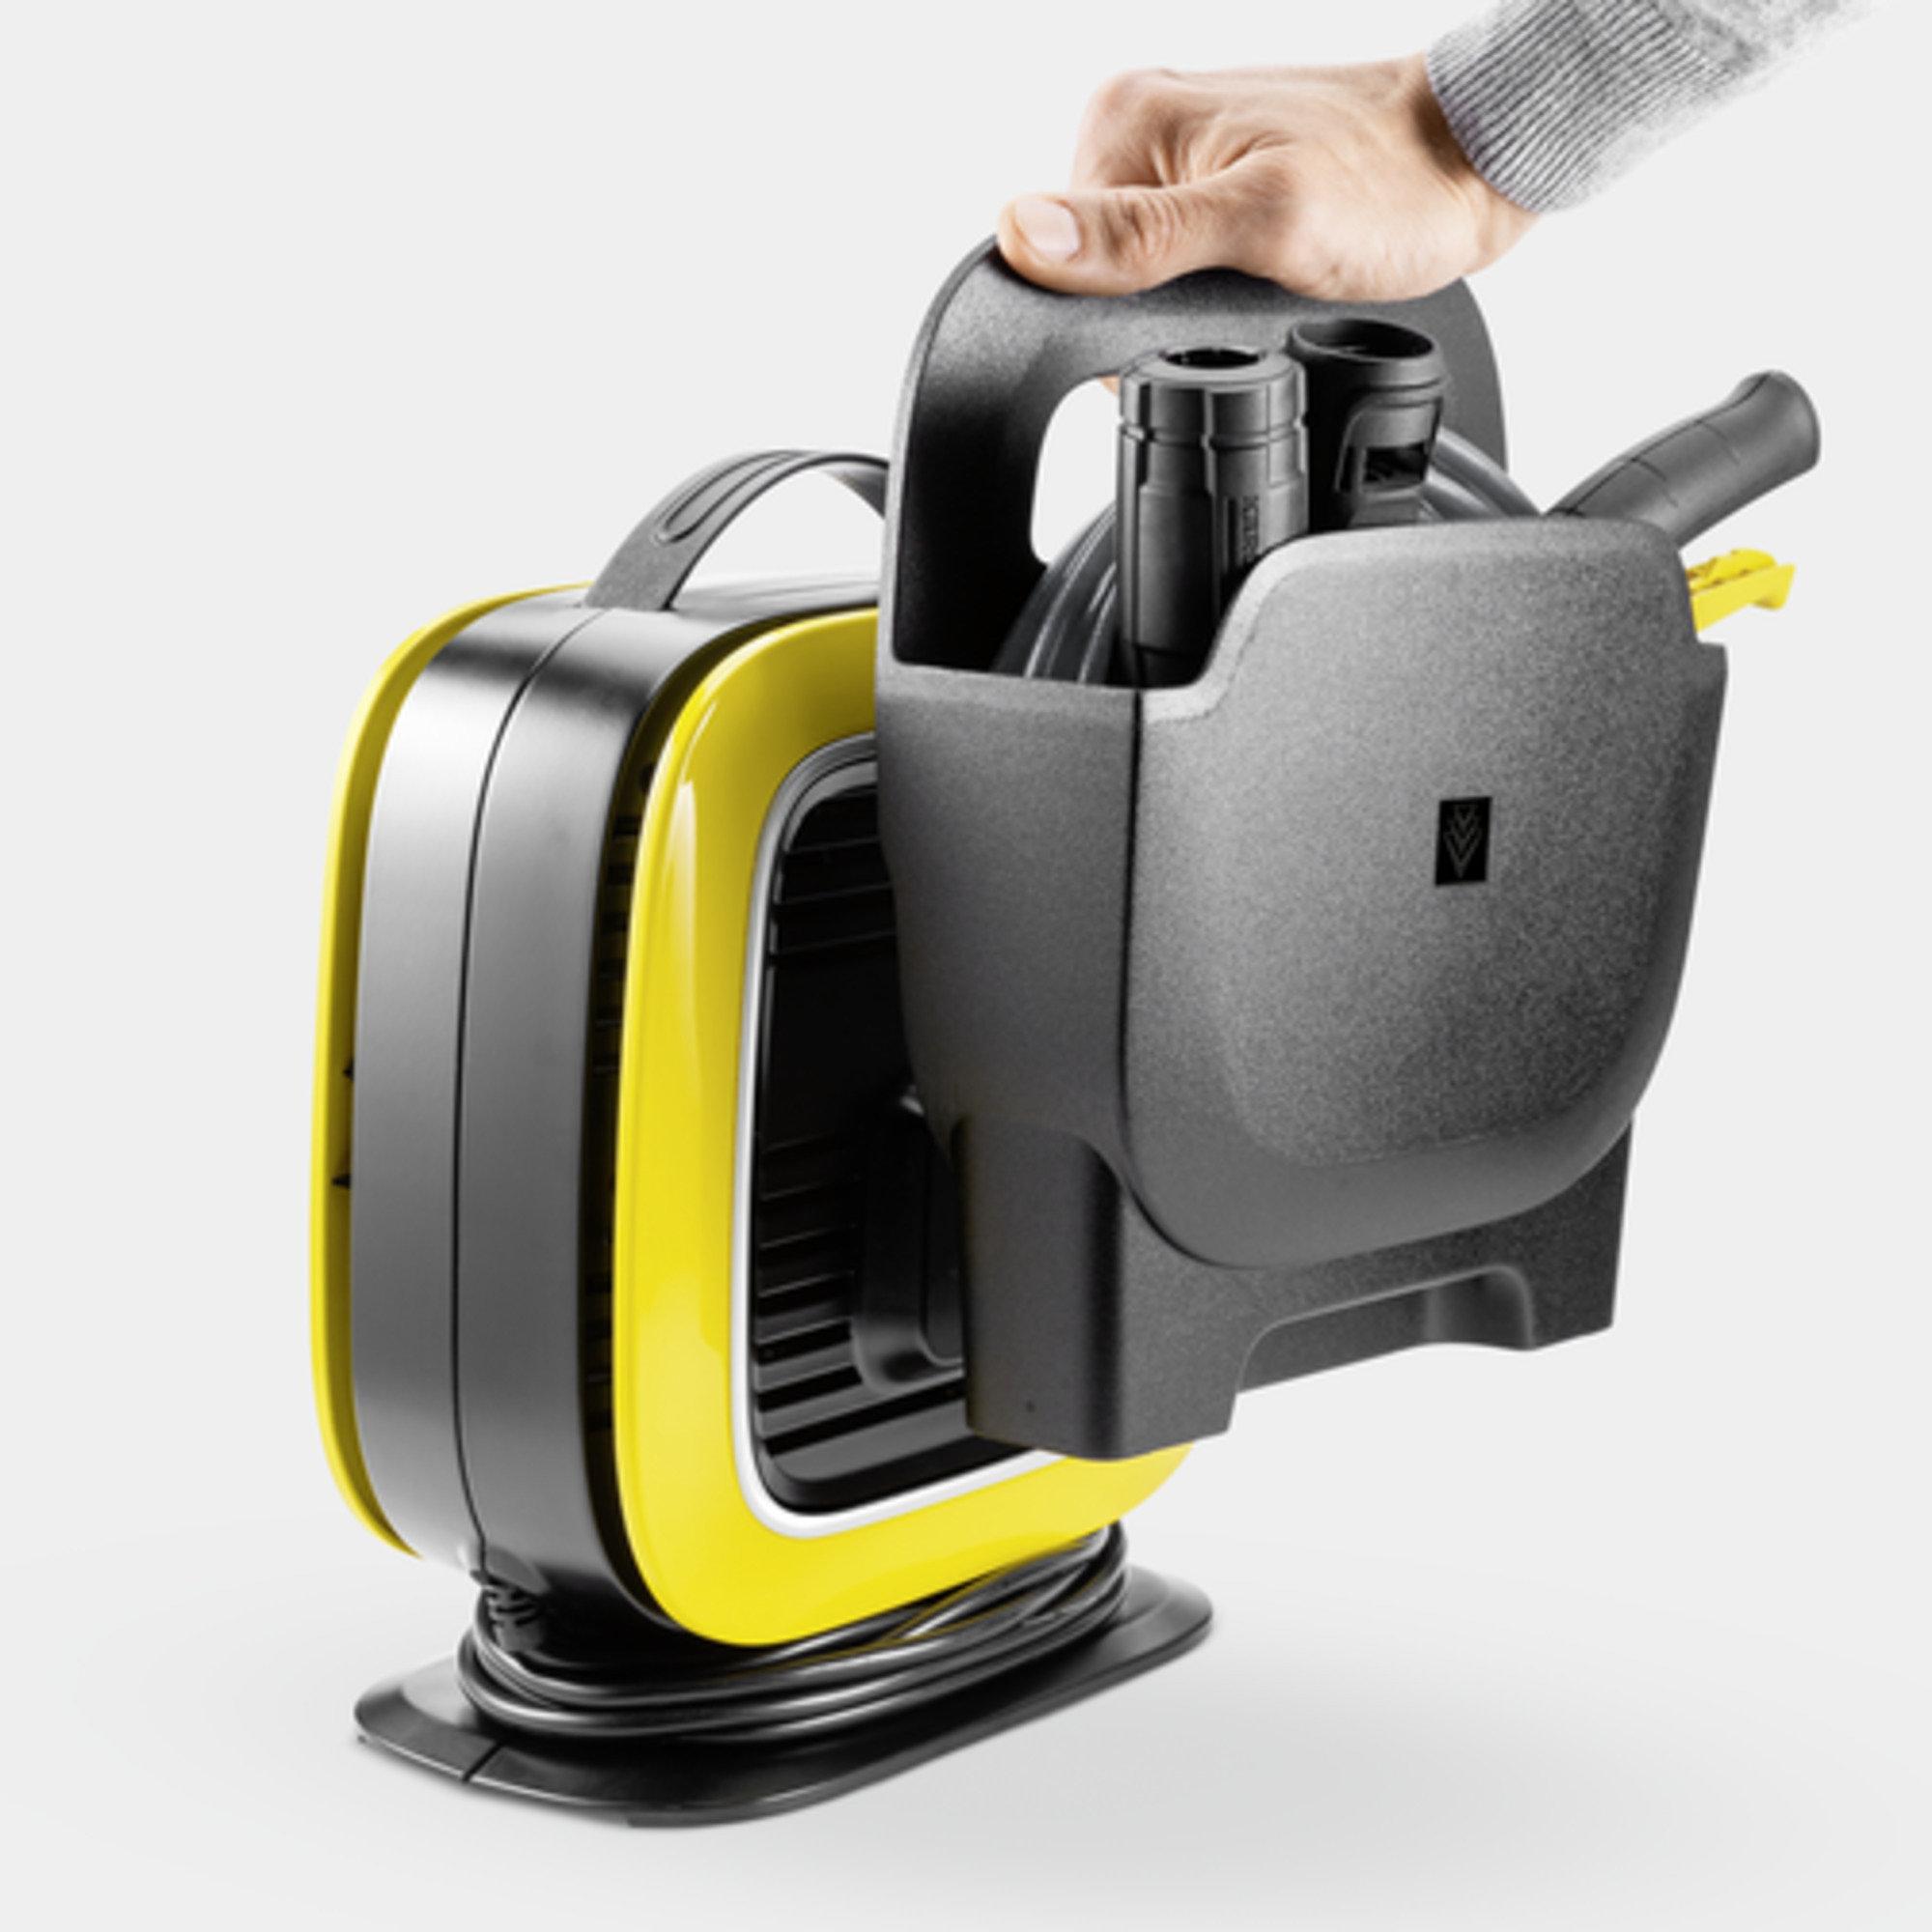 High pressure washer K Mini : Detachable accessory holder